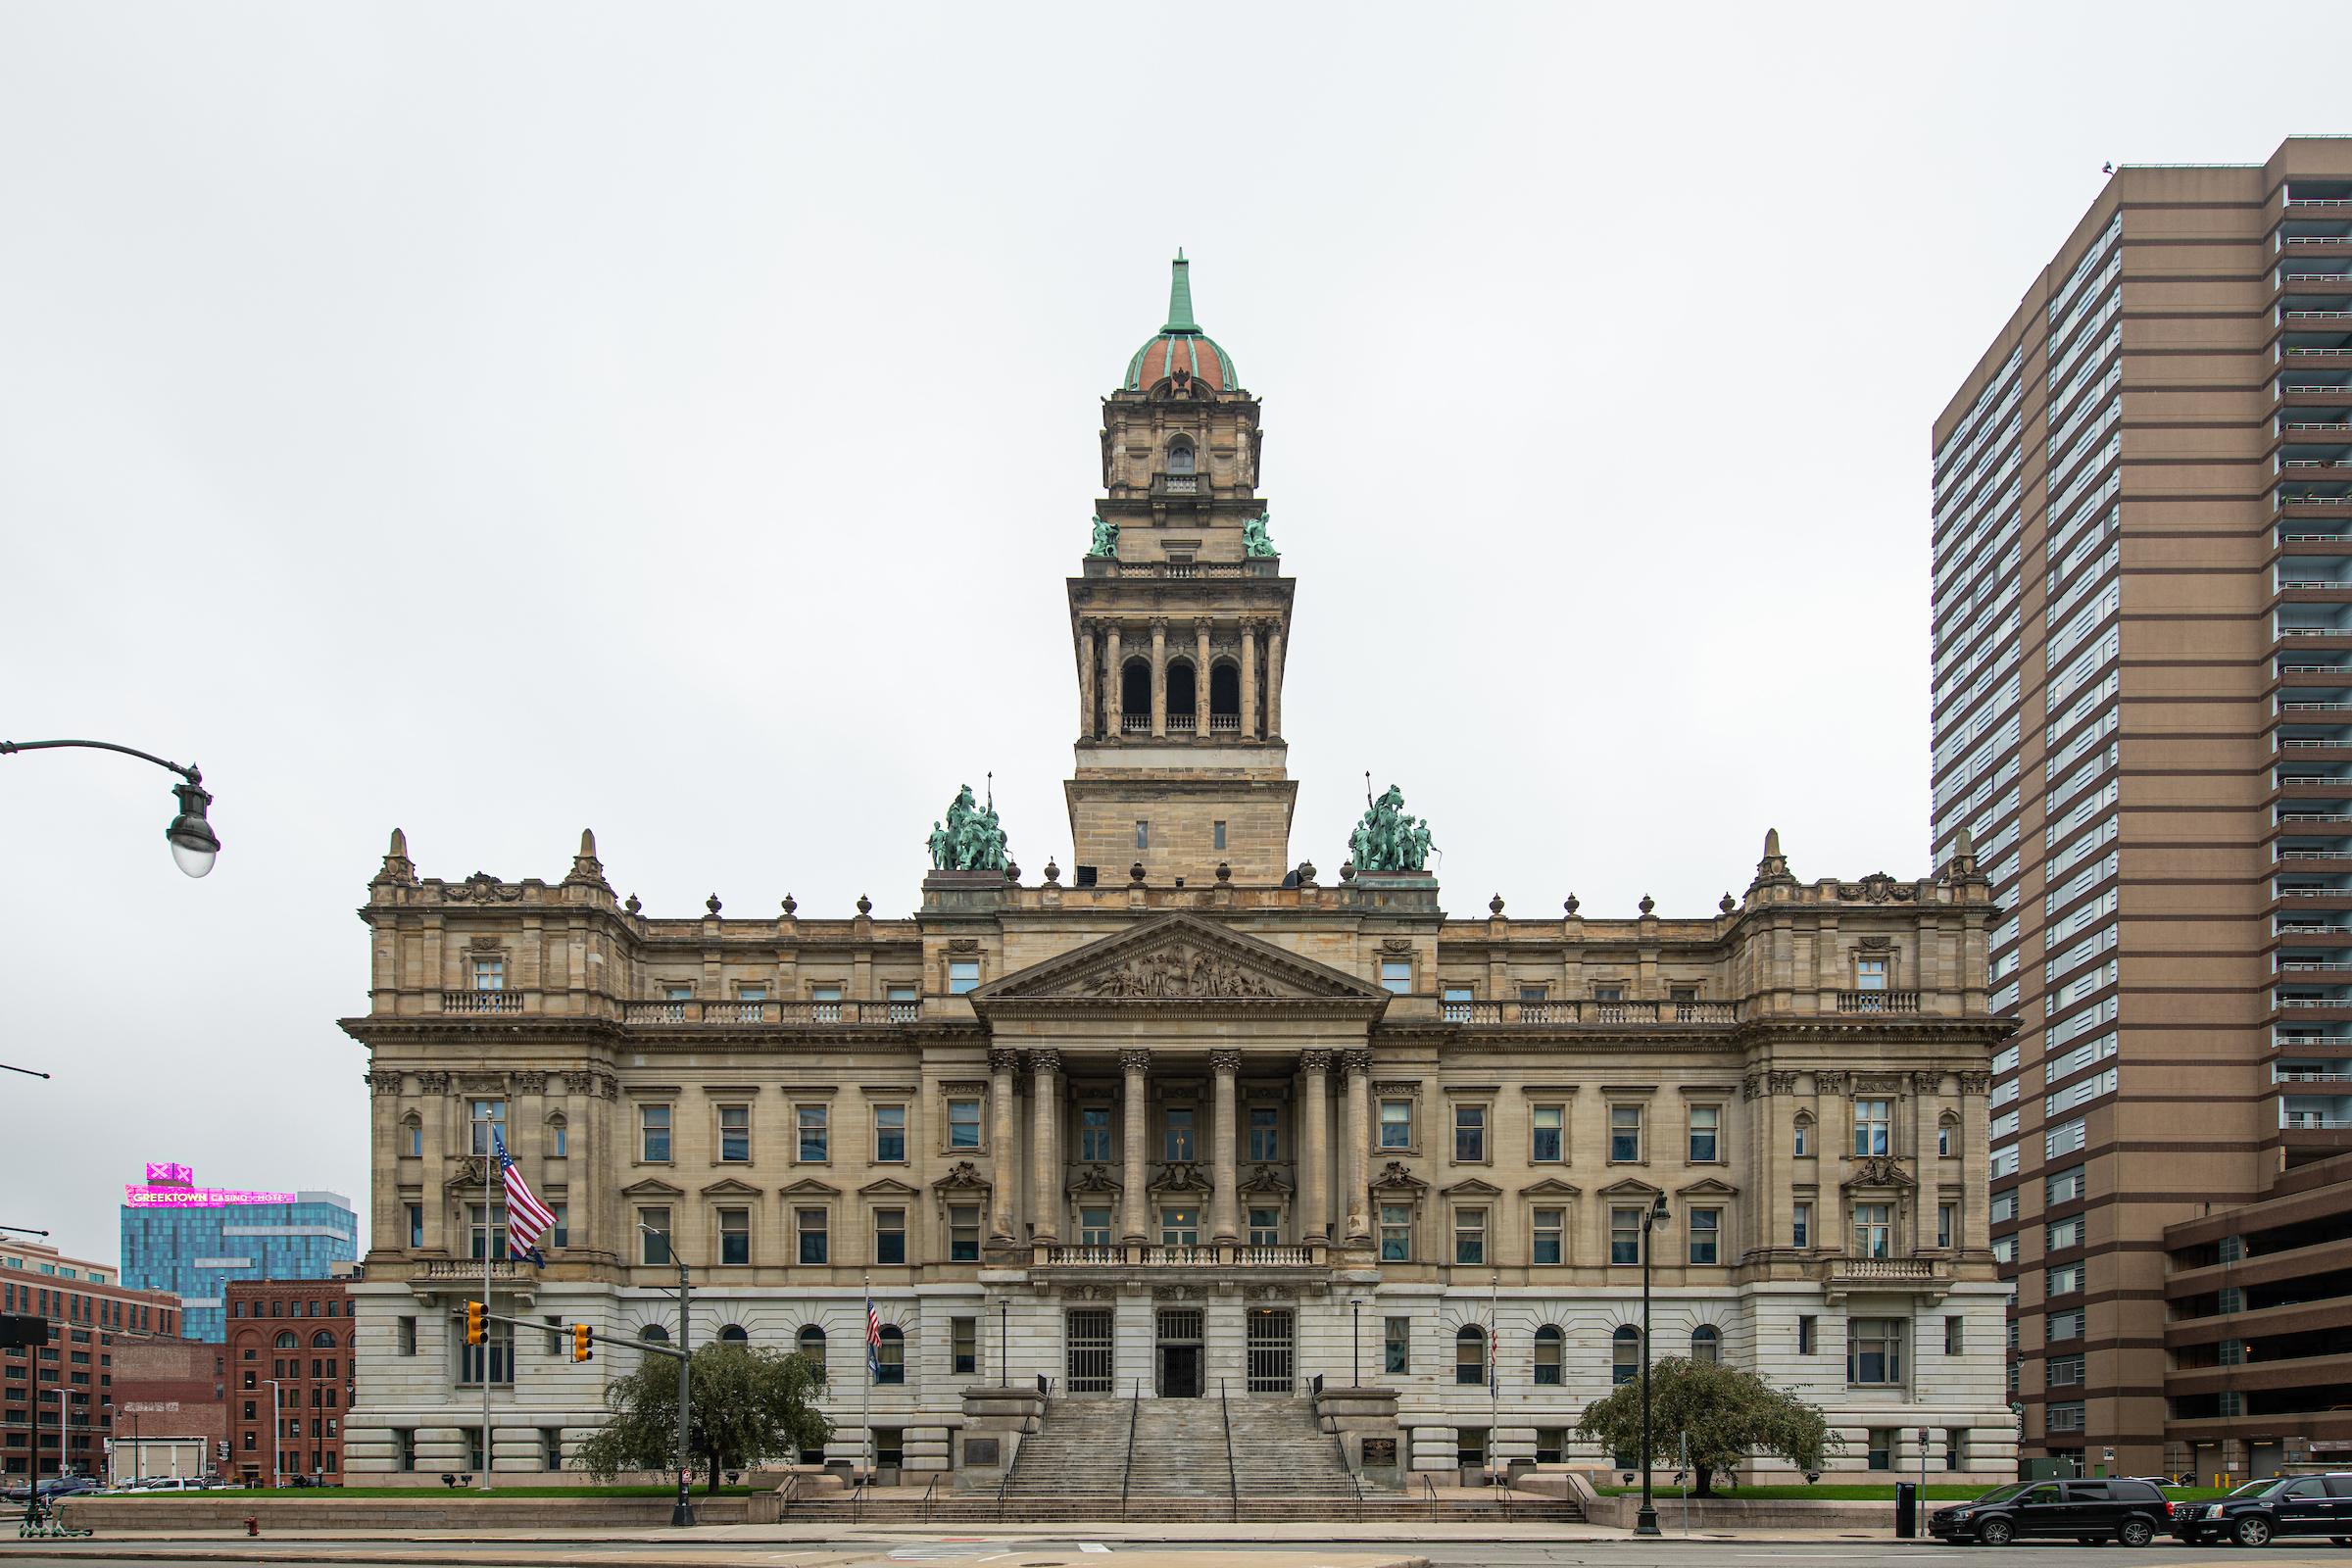 Wayne County Building. Image credit: Austin Thomason, Michigan Photography